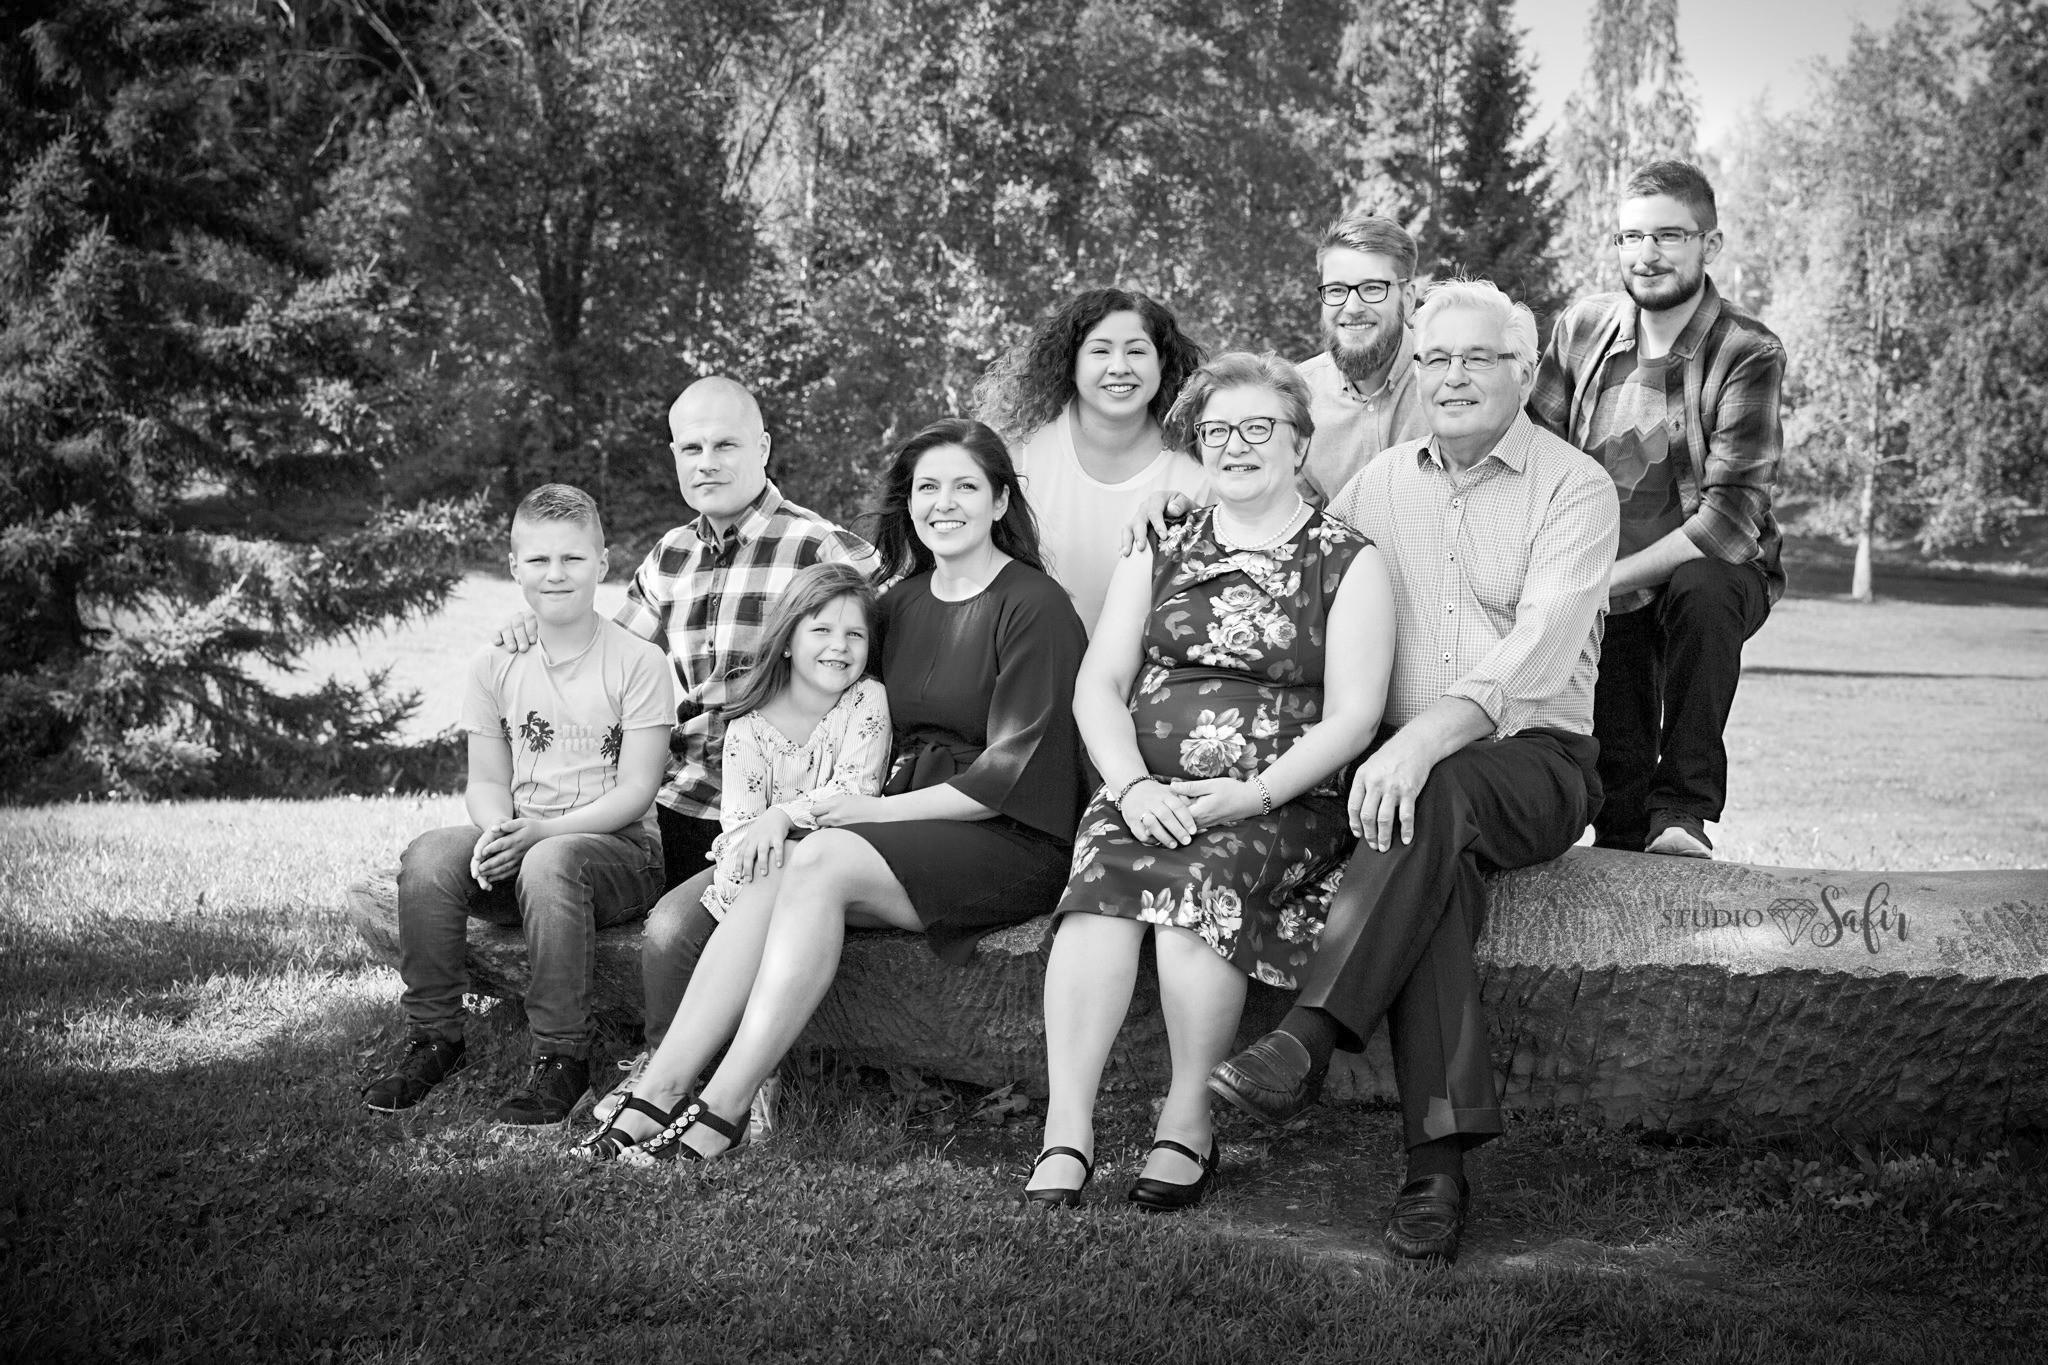 Ryhmäkuvaus / Gruppfotografering